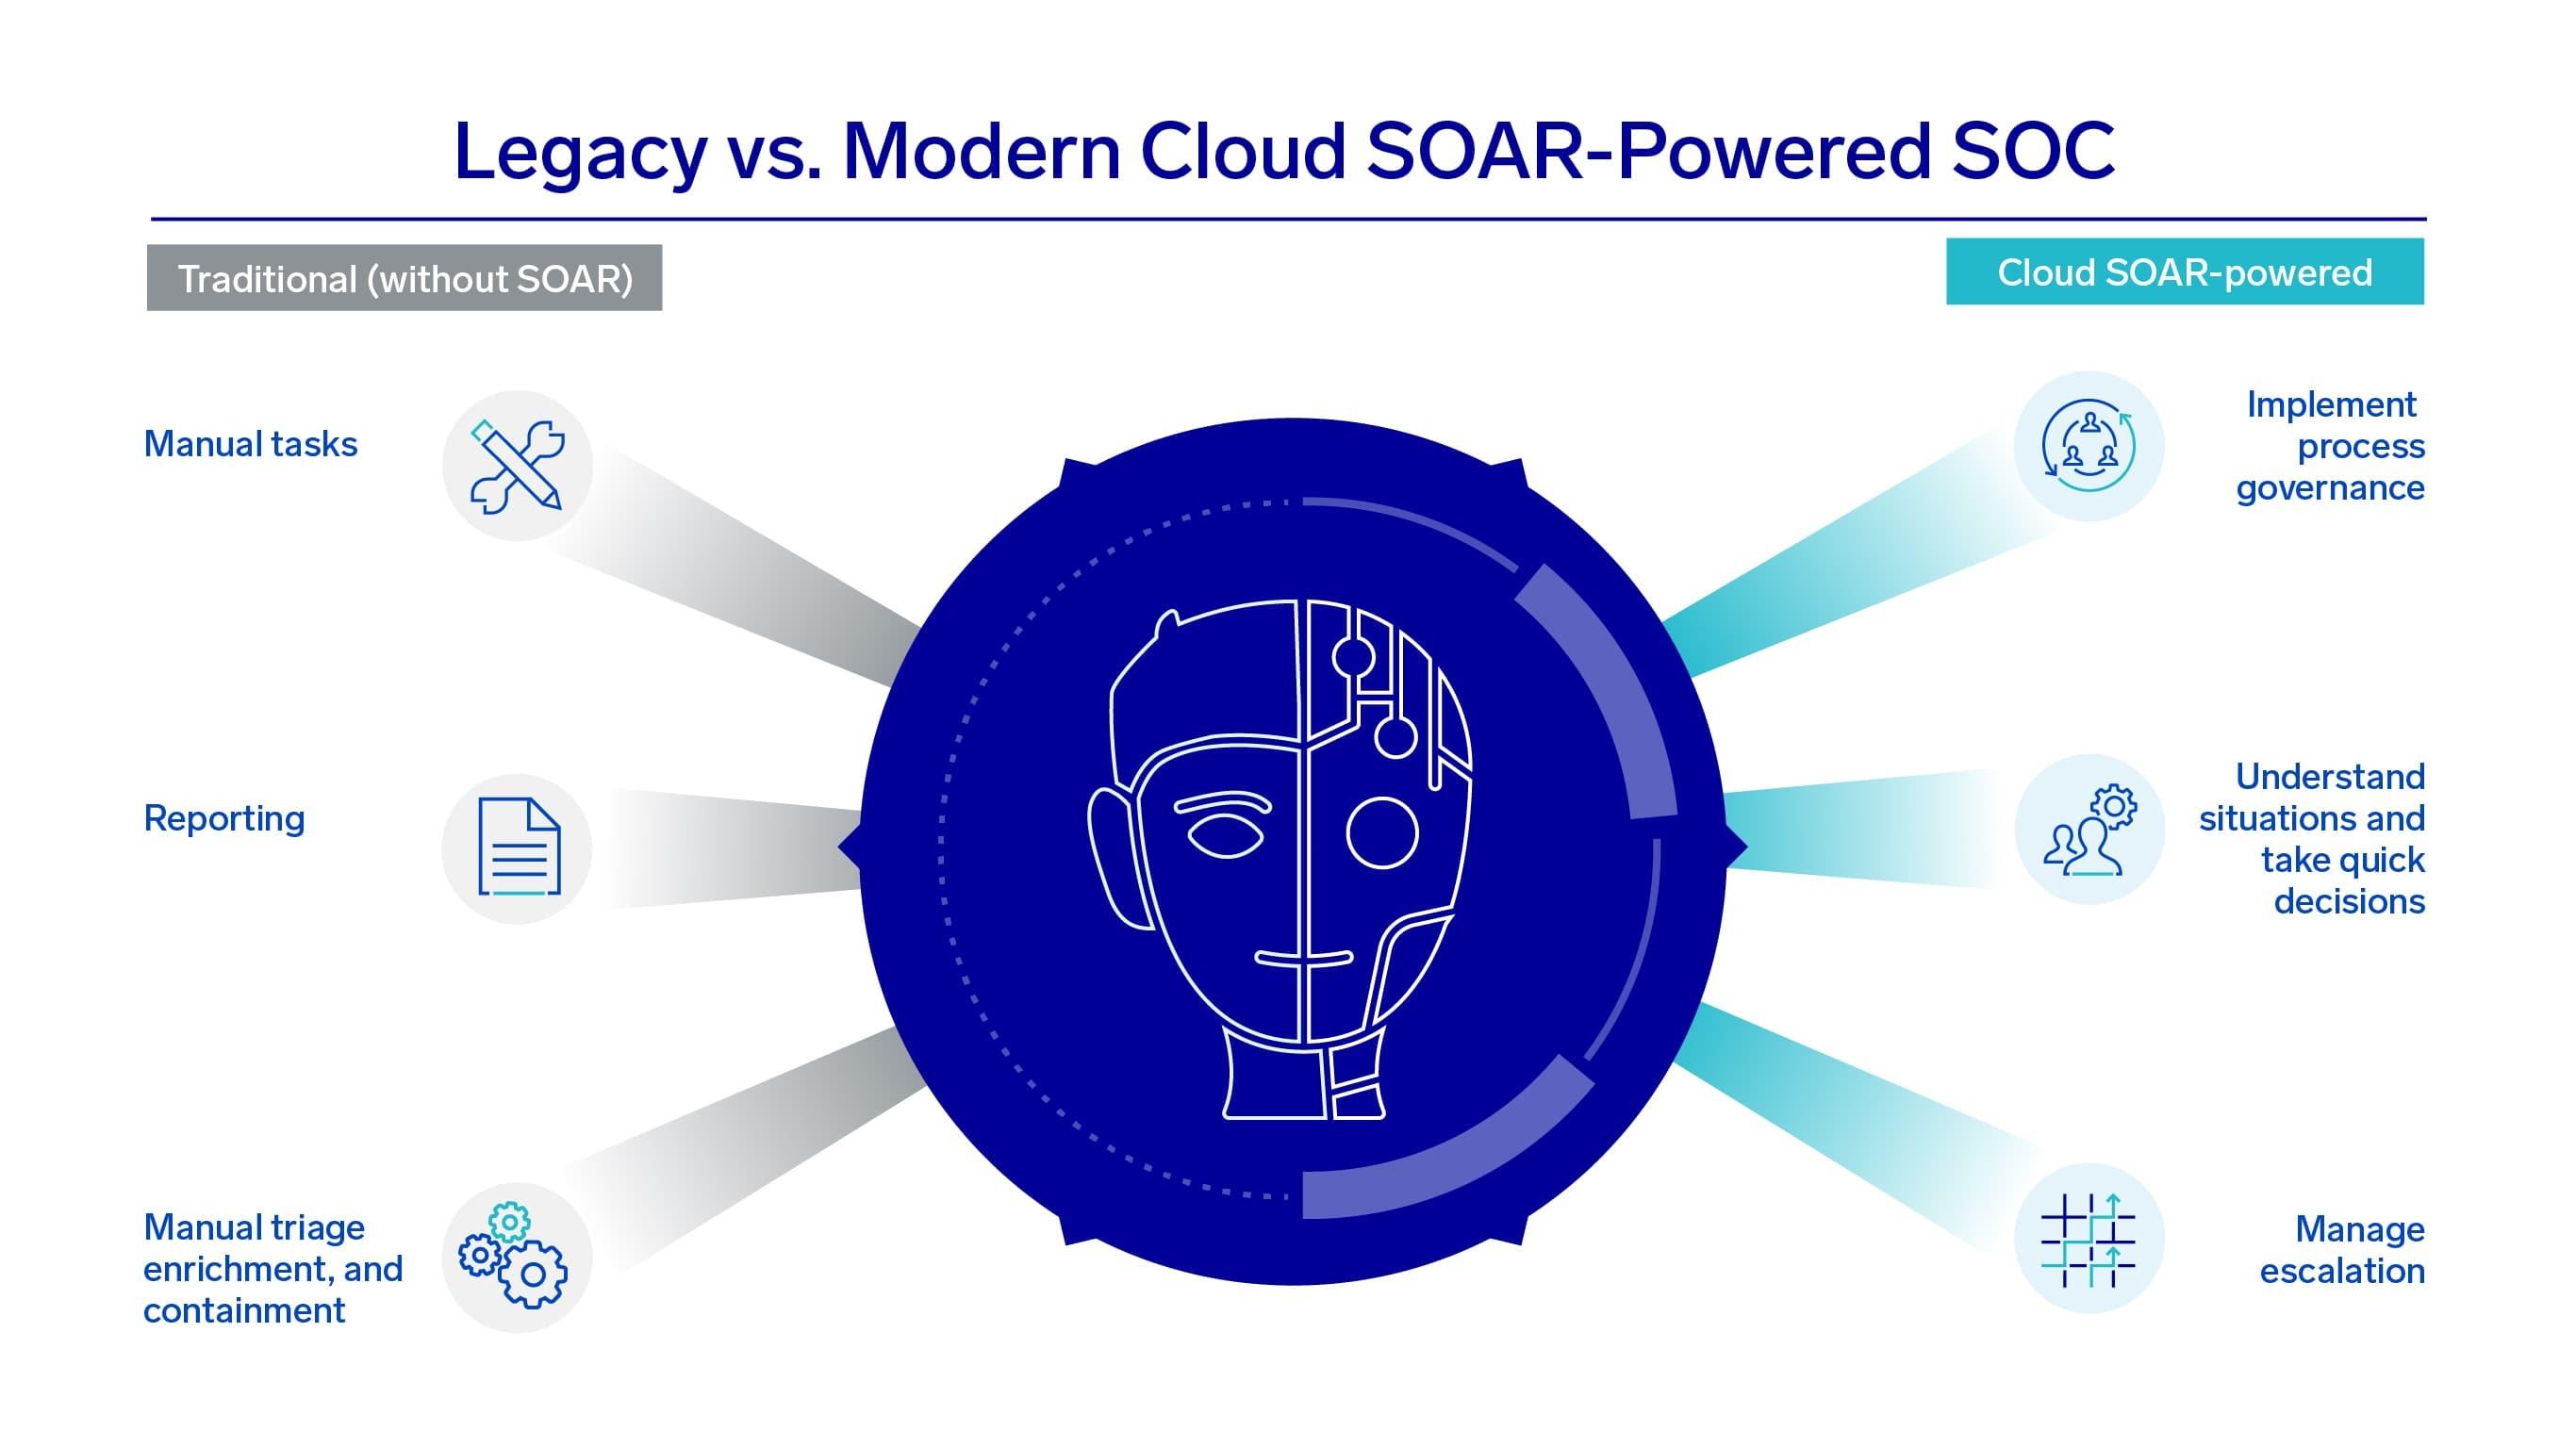 Legacy vs Modern Cloud SOAR-Powered SOC